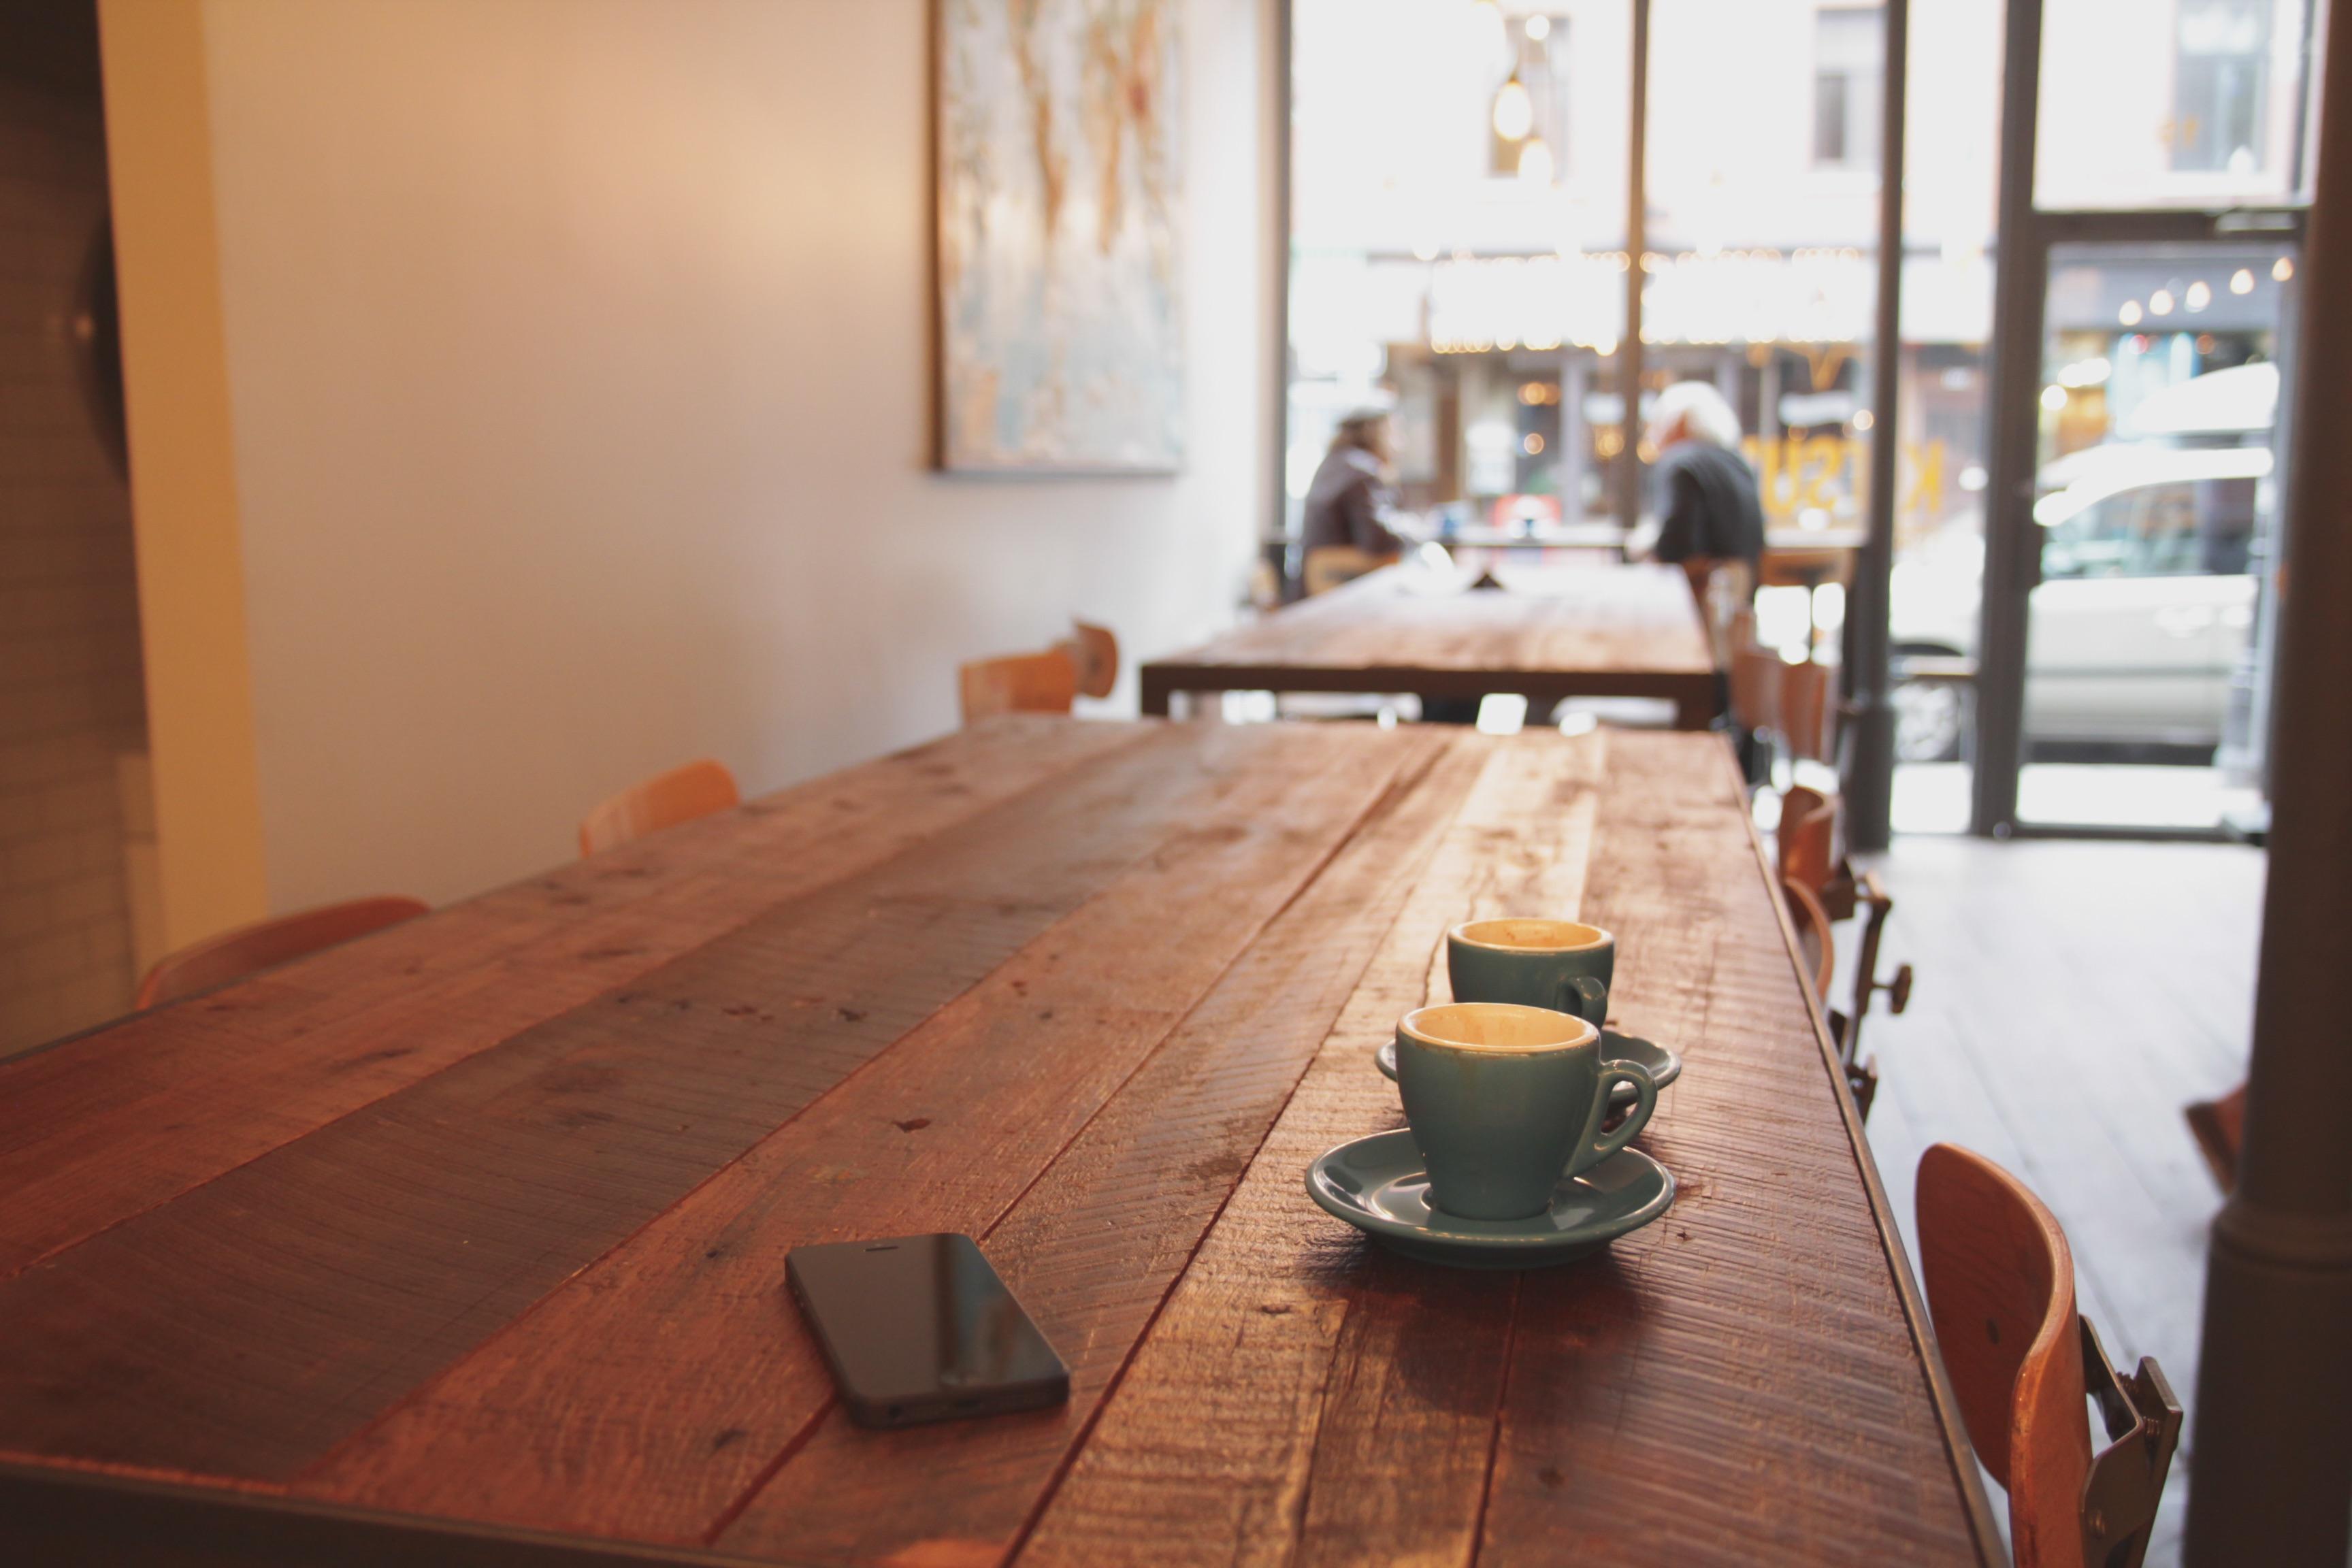 Innenarchitektur Cafe kostenlose foto iphone tabelle cafe café kaffee holz haus